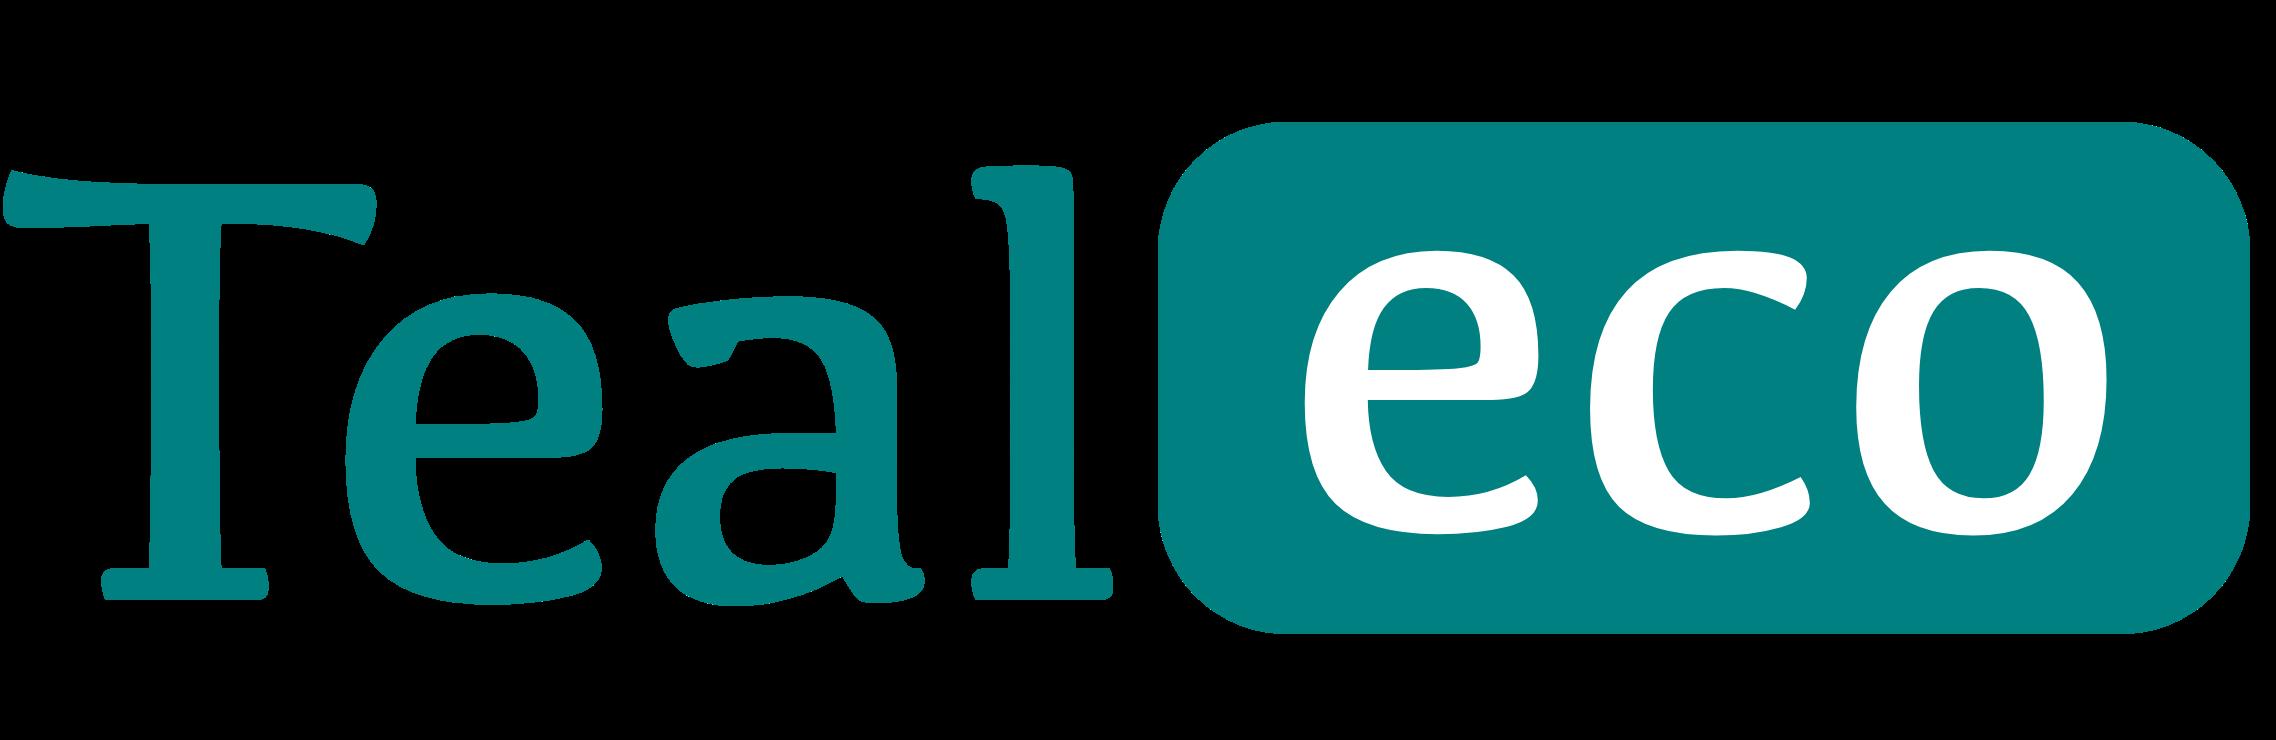 Tealeco logo